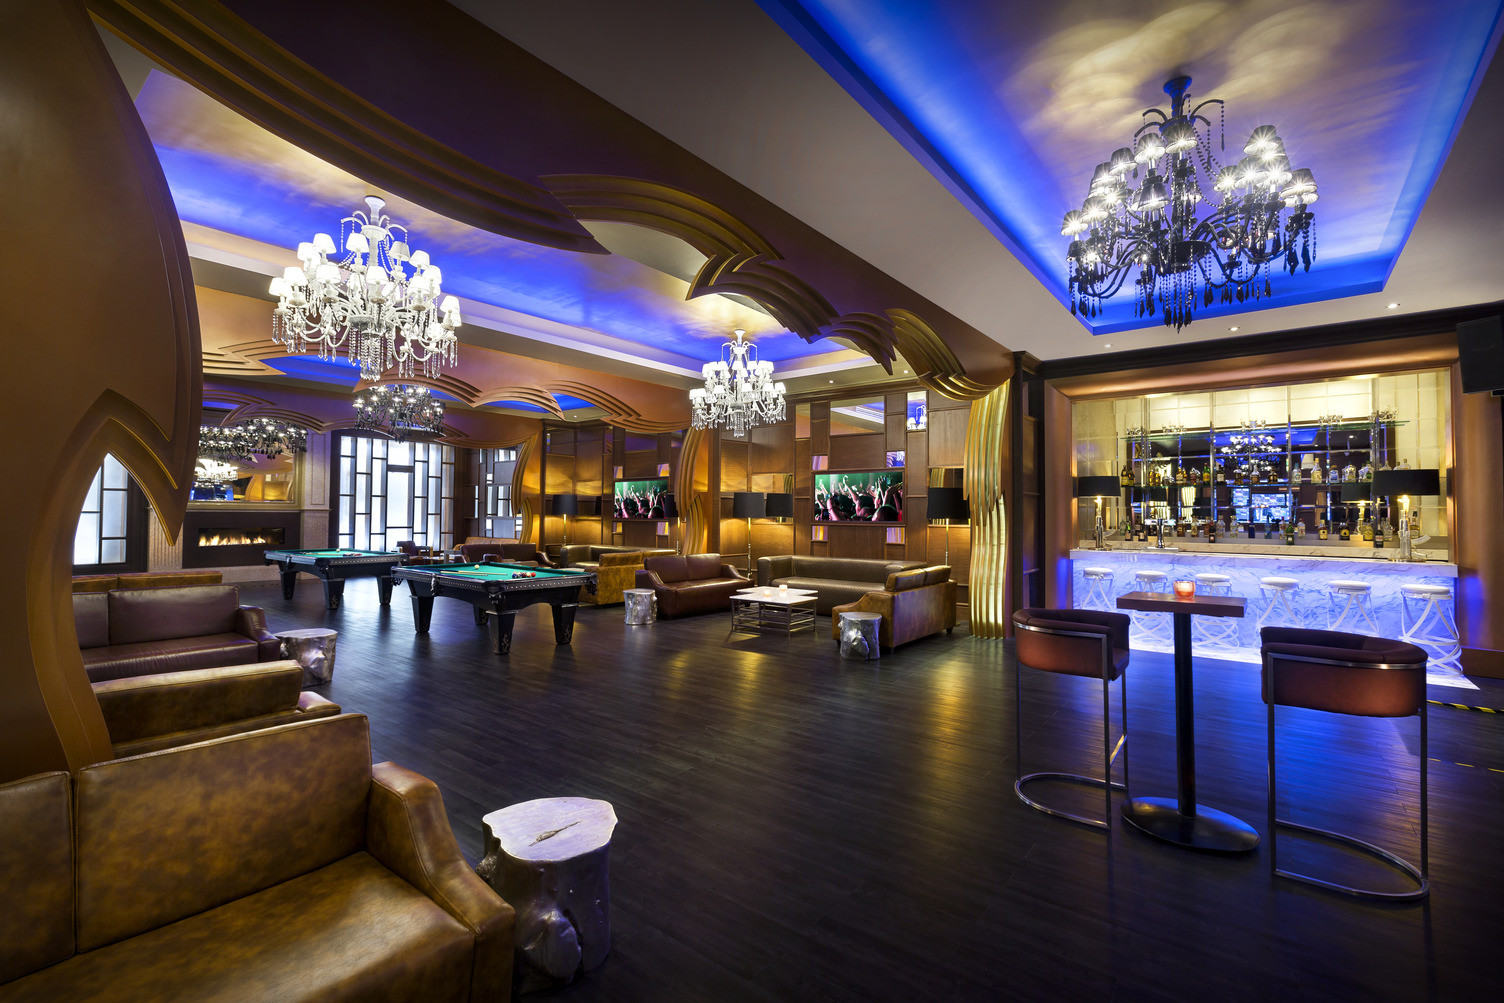 Travel Agency All-Inclusive Resort Heaven at Hard Rock Hotel Riviera Maya 54